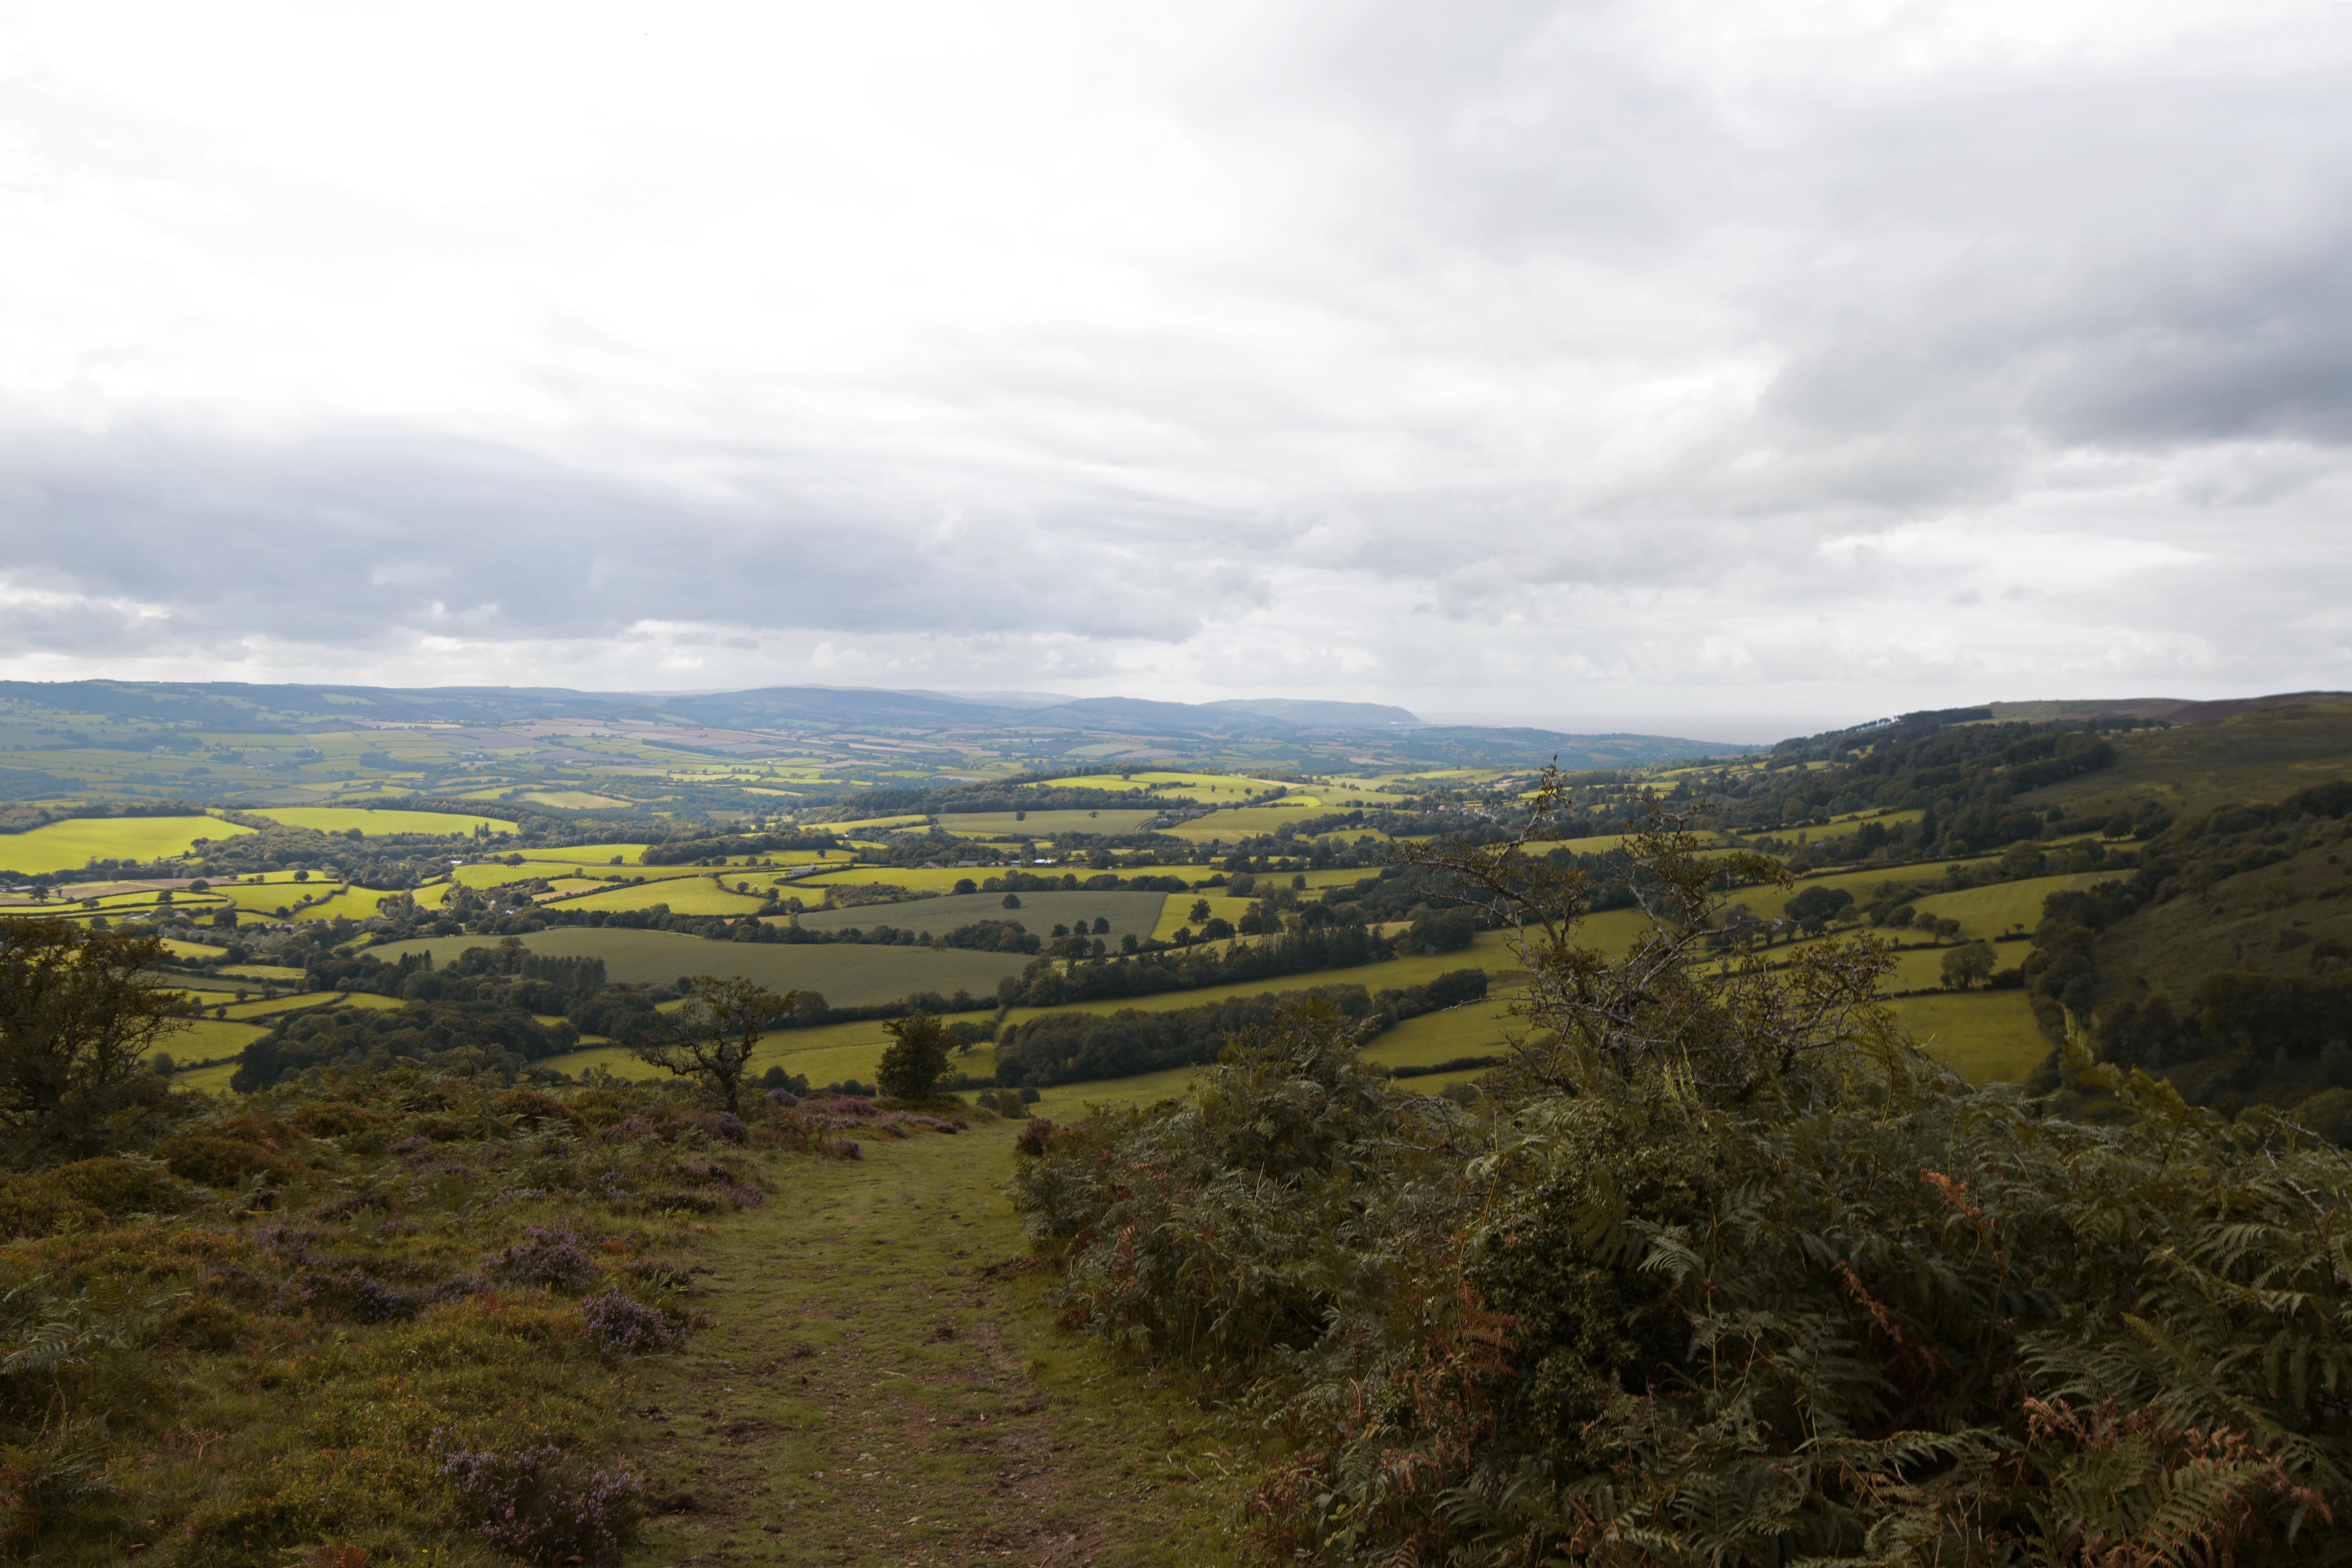 Quantock Hills, South West